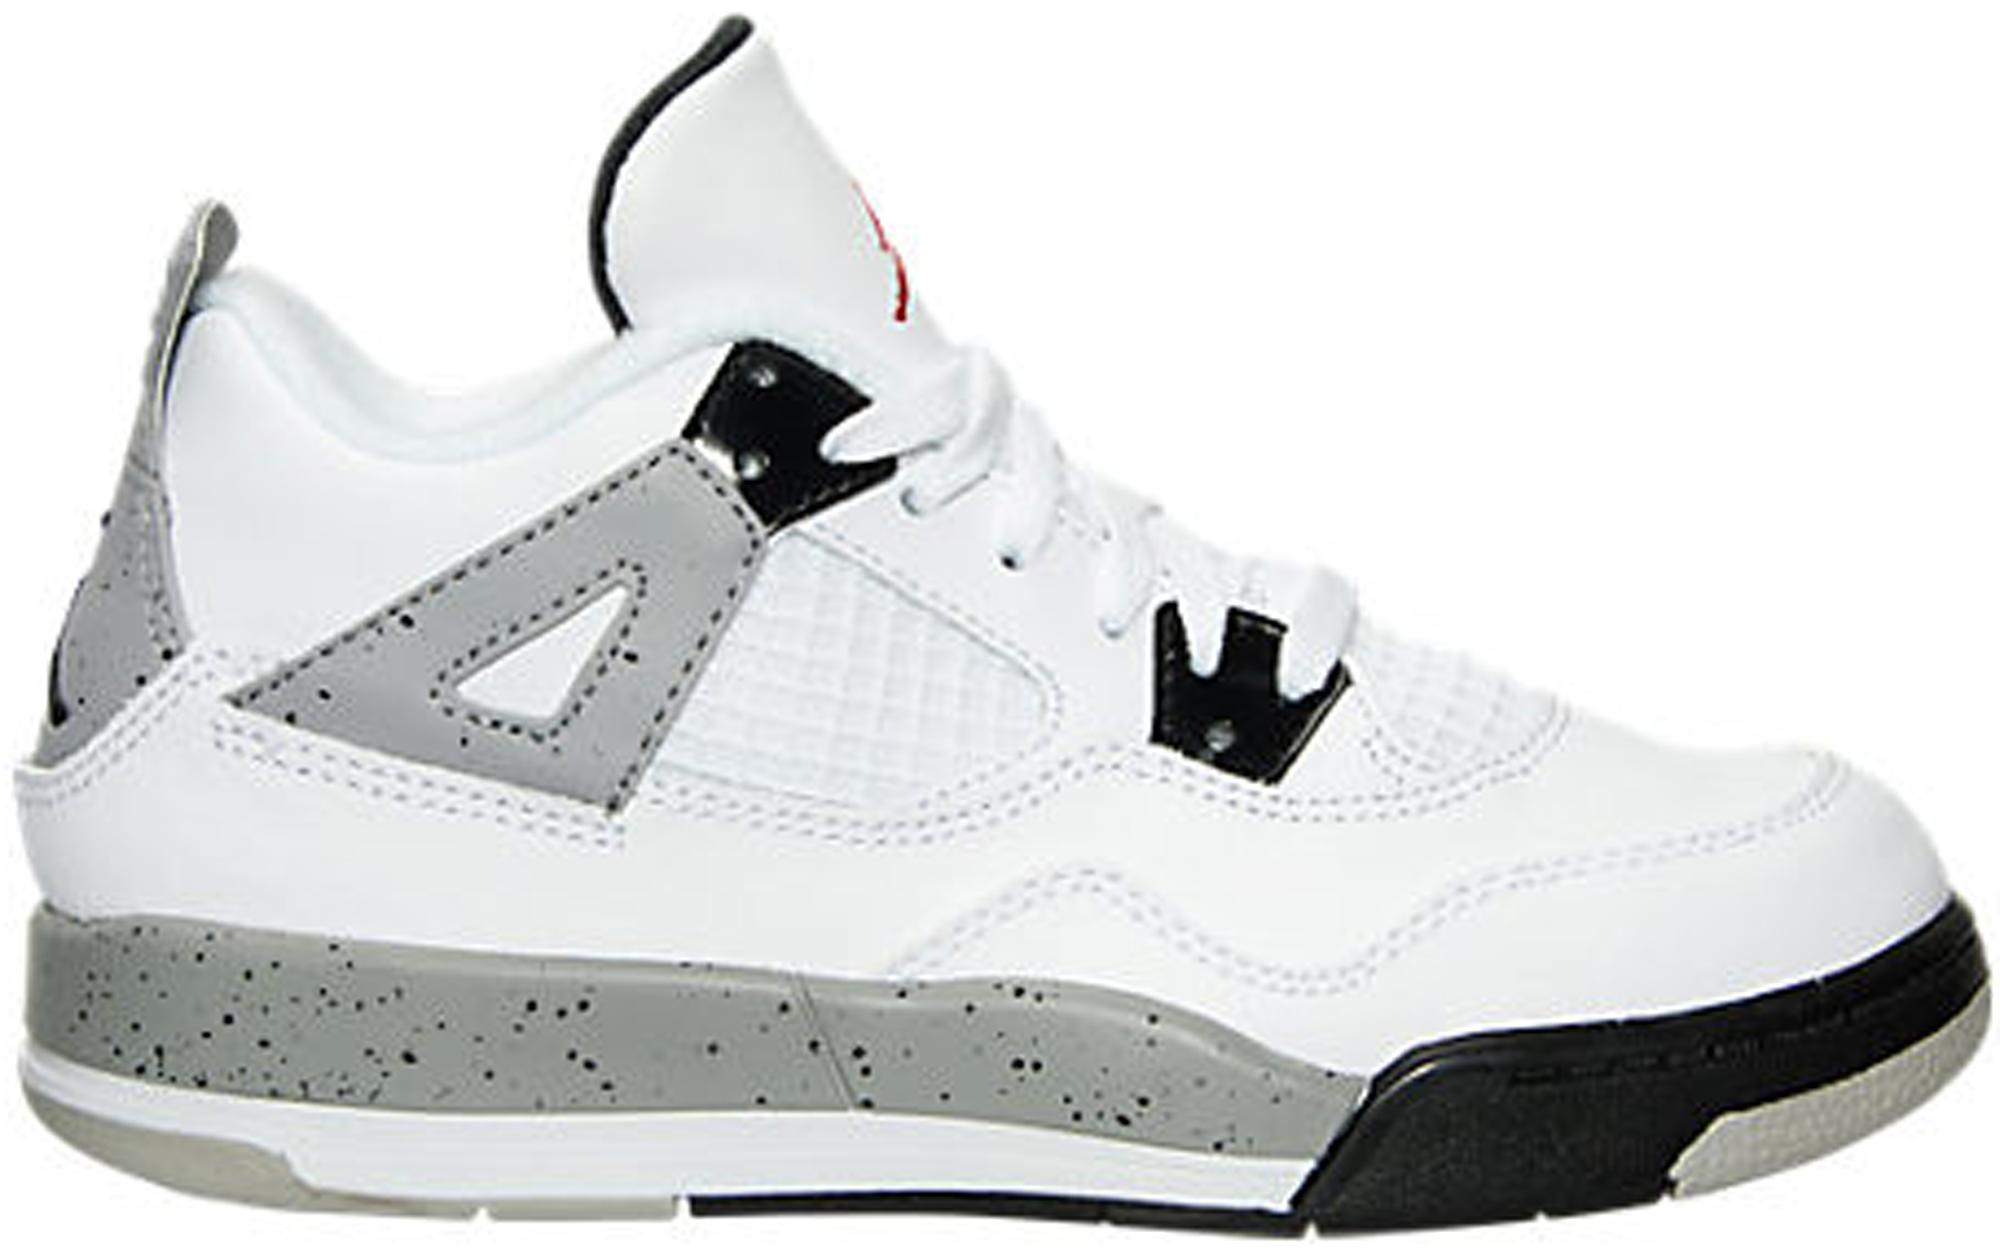 Jordan 4 Retro White Cement 2016 (PS)